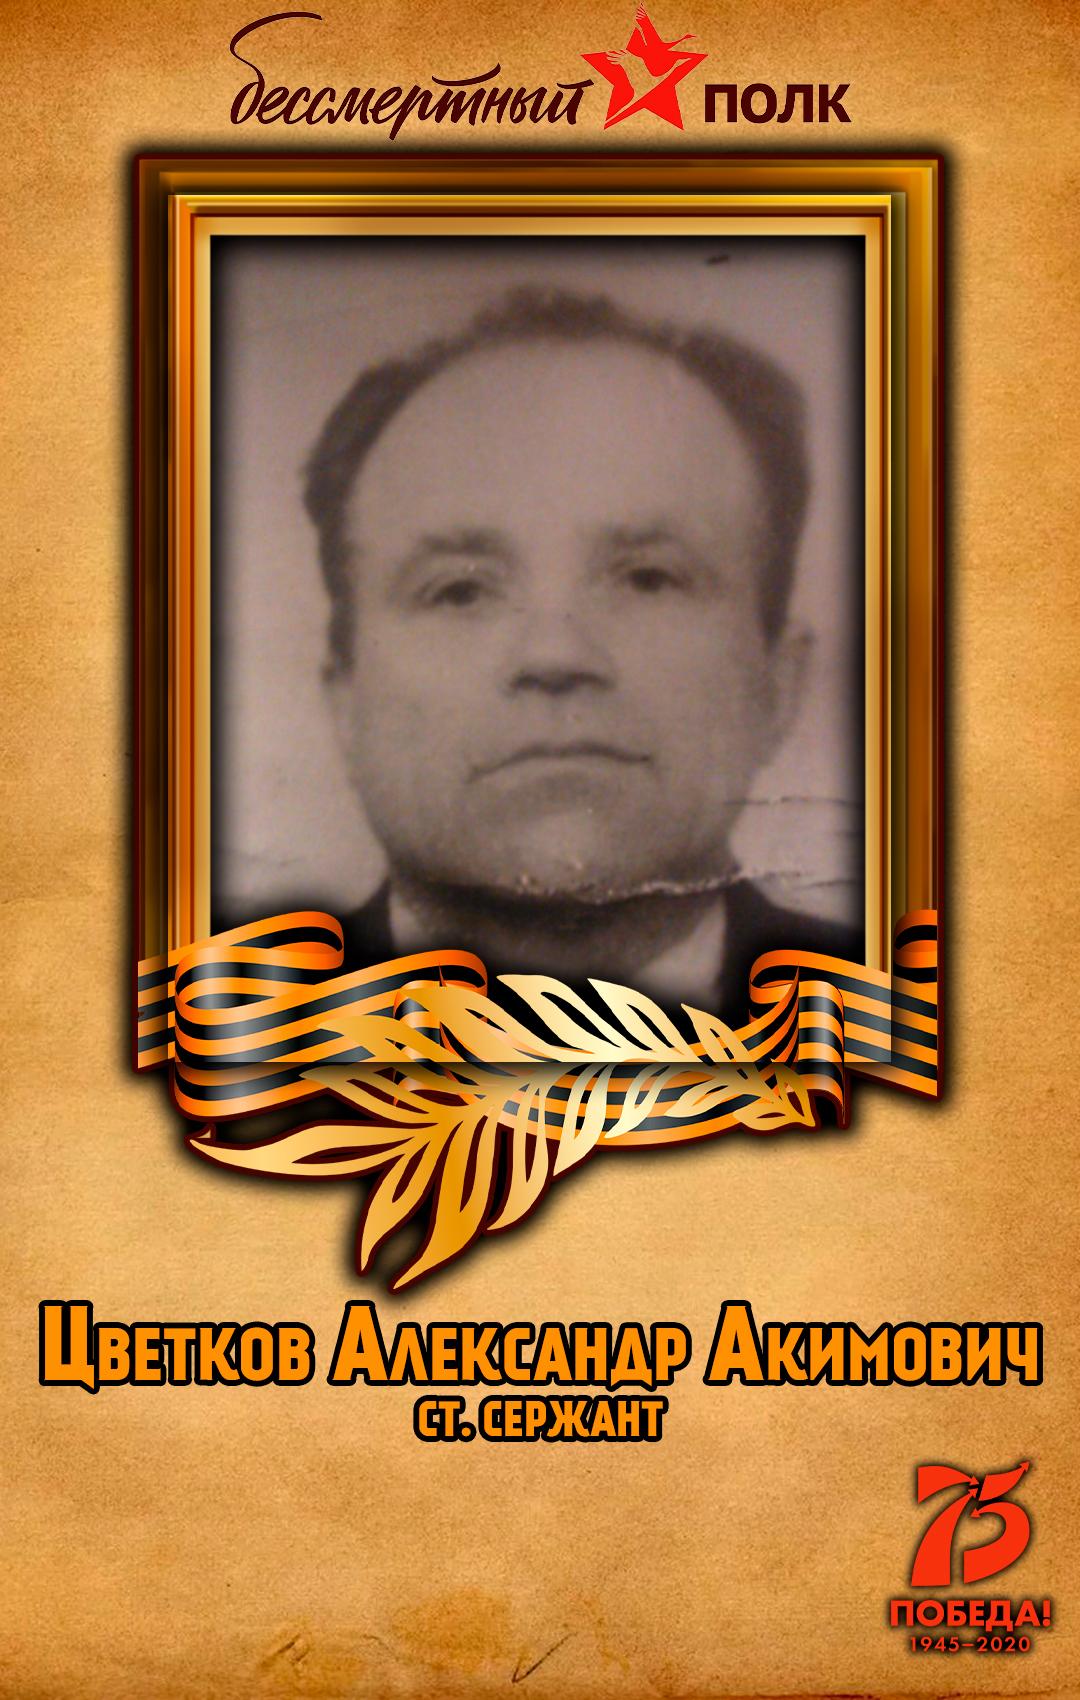 Цветков-Александр-Акимович